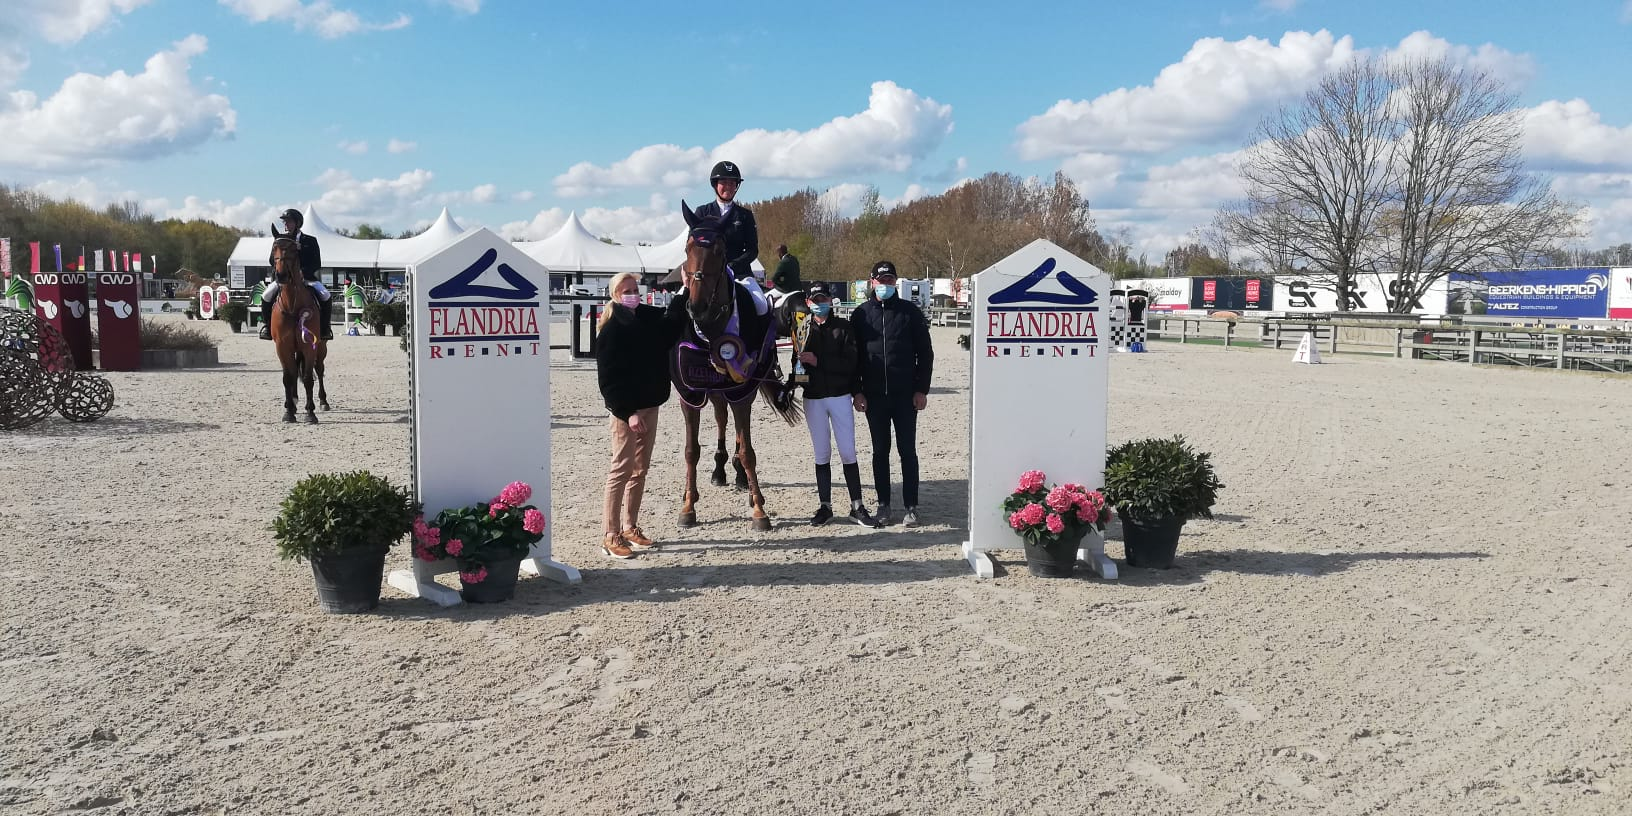 Charlotte Bettendorf takes CSI3* Grand Prix of Lier home